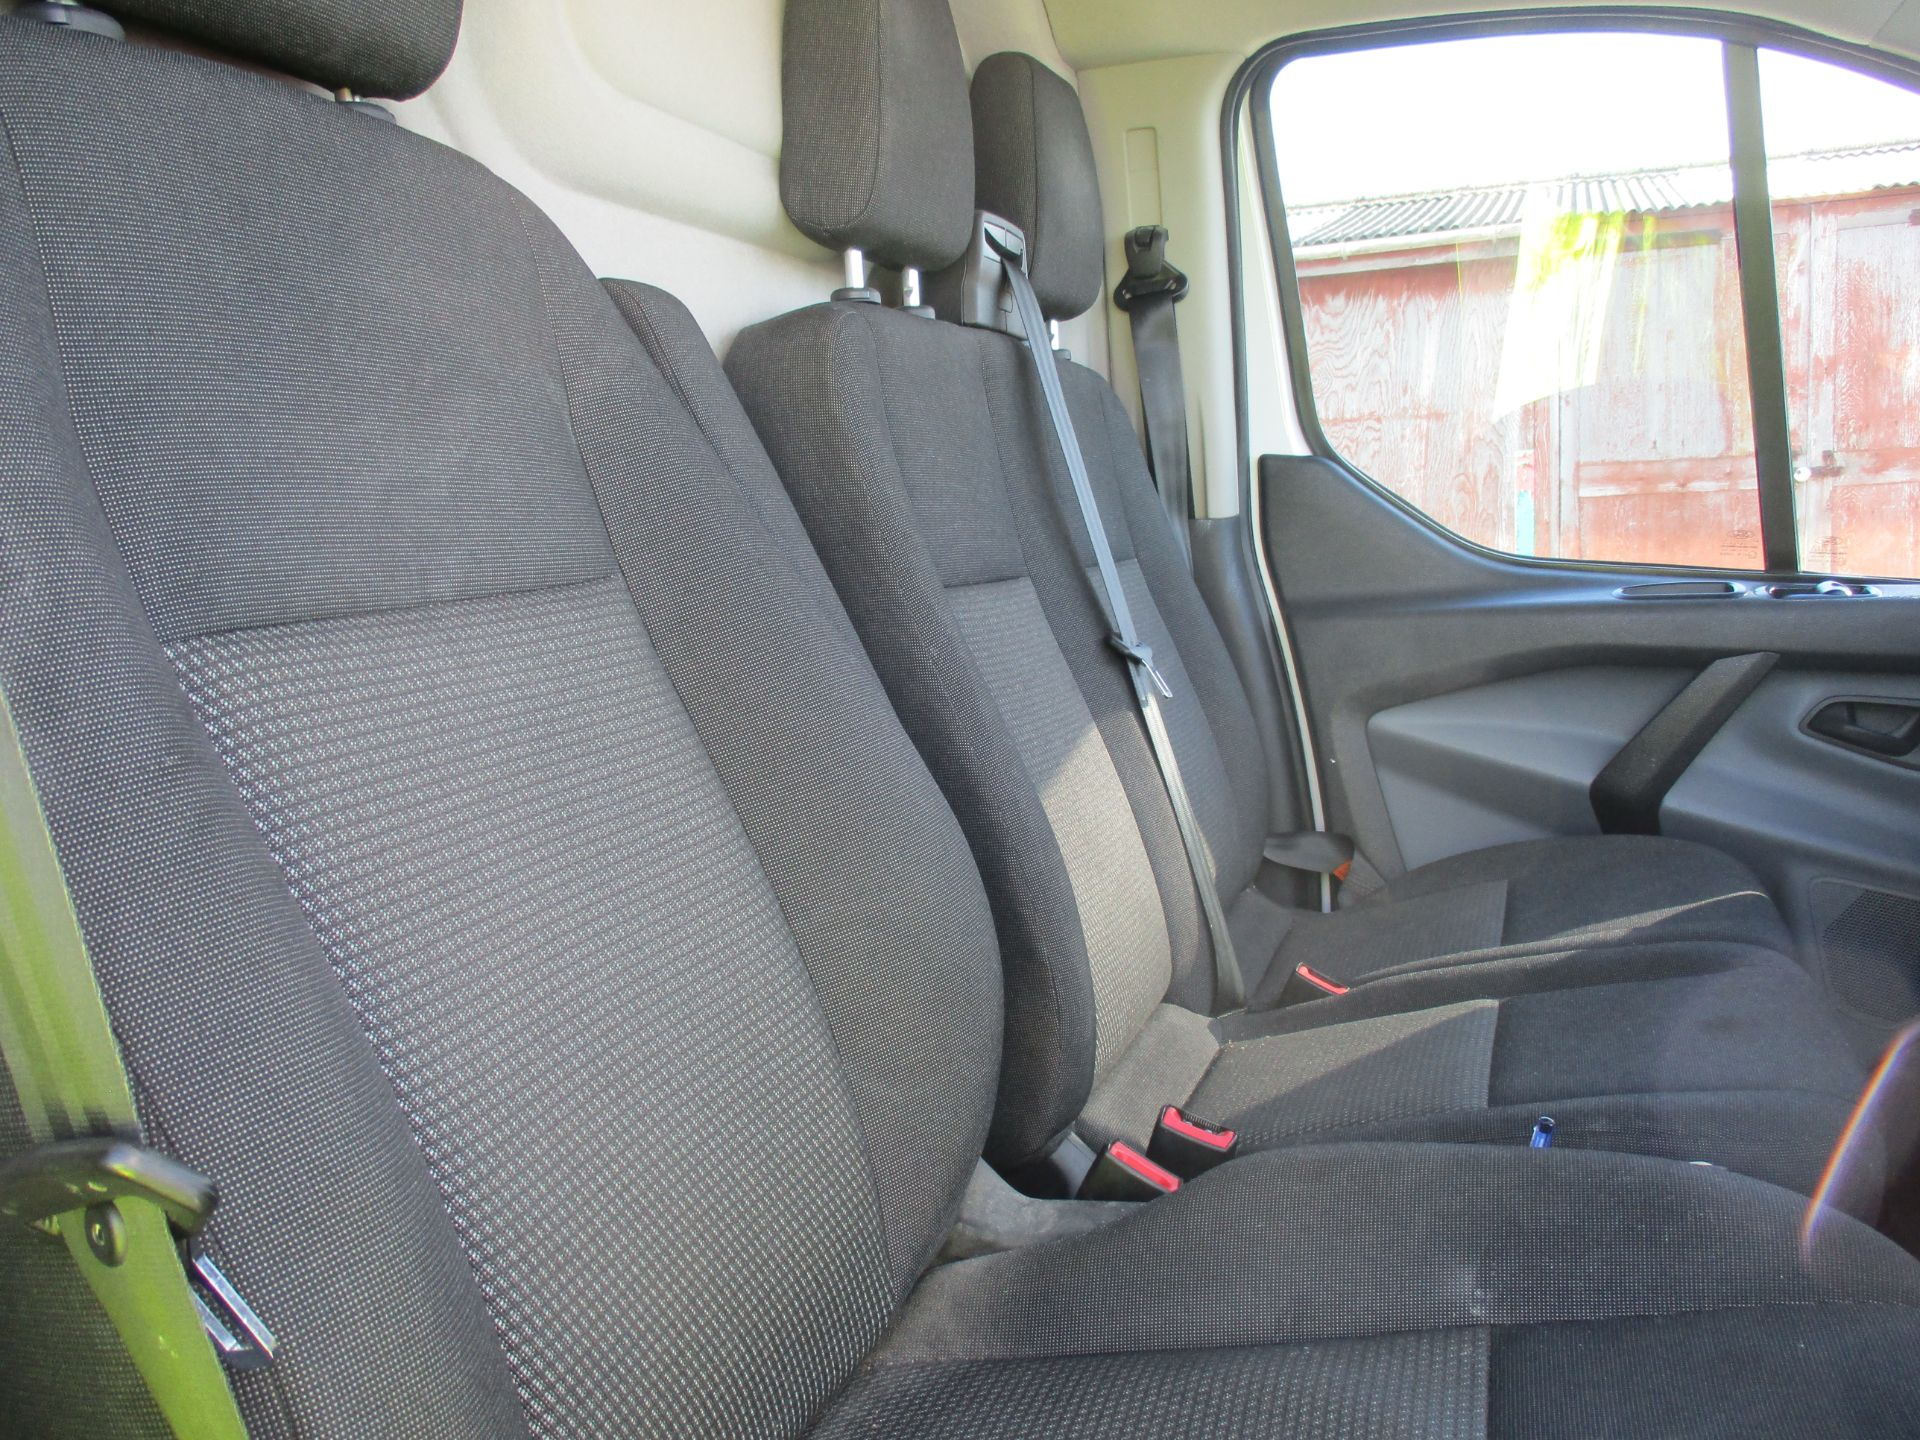 2017 Ford Transit Custom 290 L1 DIESEL FWD 2.0 TDCI 105PS LOW ROOF VAN EURO 6 (FP17VGJ) Image 12